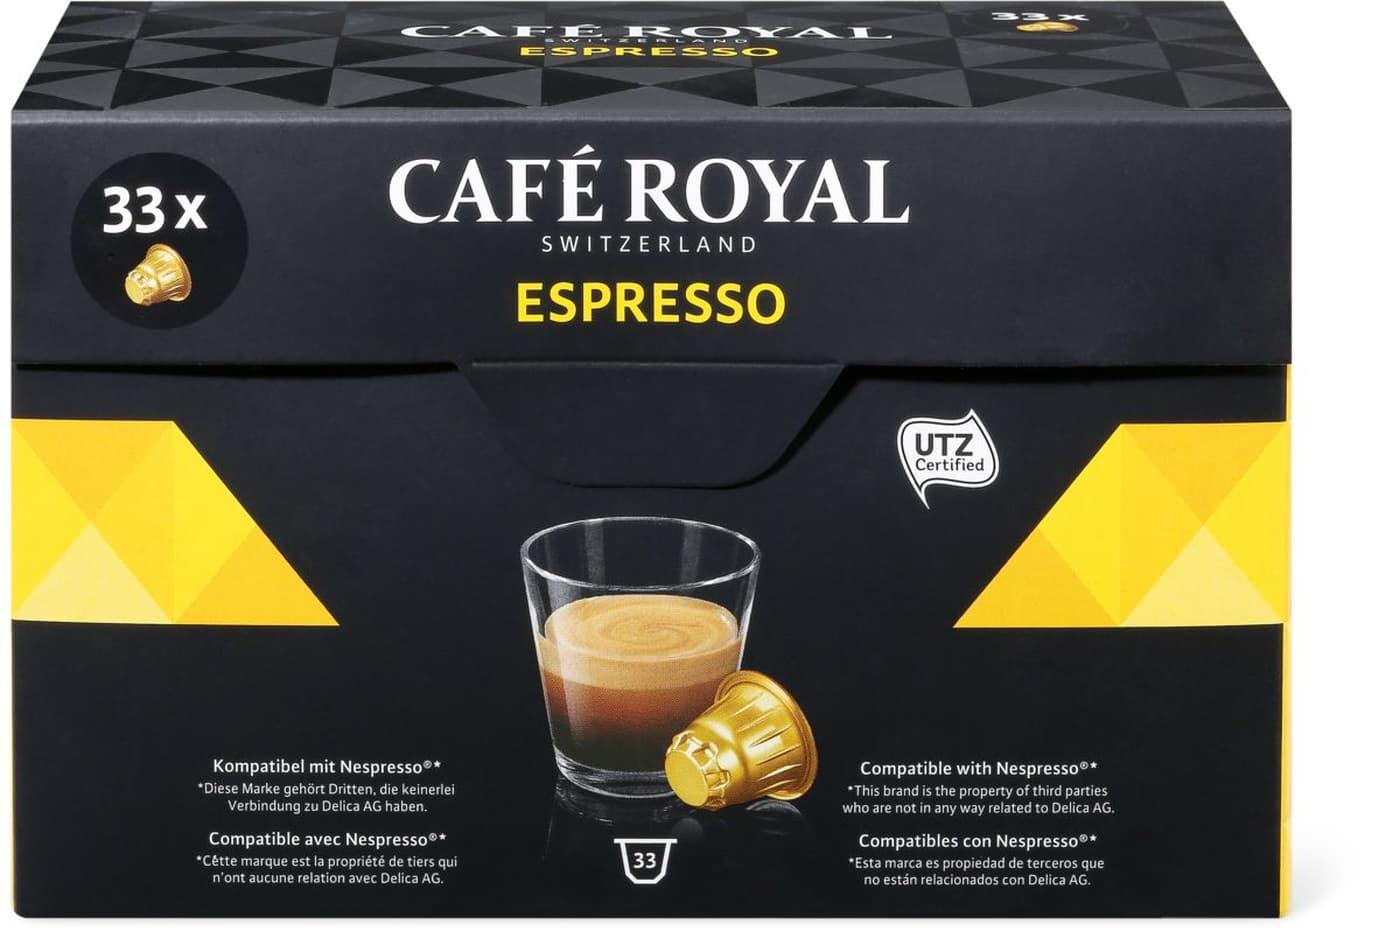 [Café Royal Switzerland] 40% Rabatt auf das gesamte Sortiment (u.a. Nespresso-Kapseln)